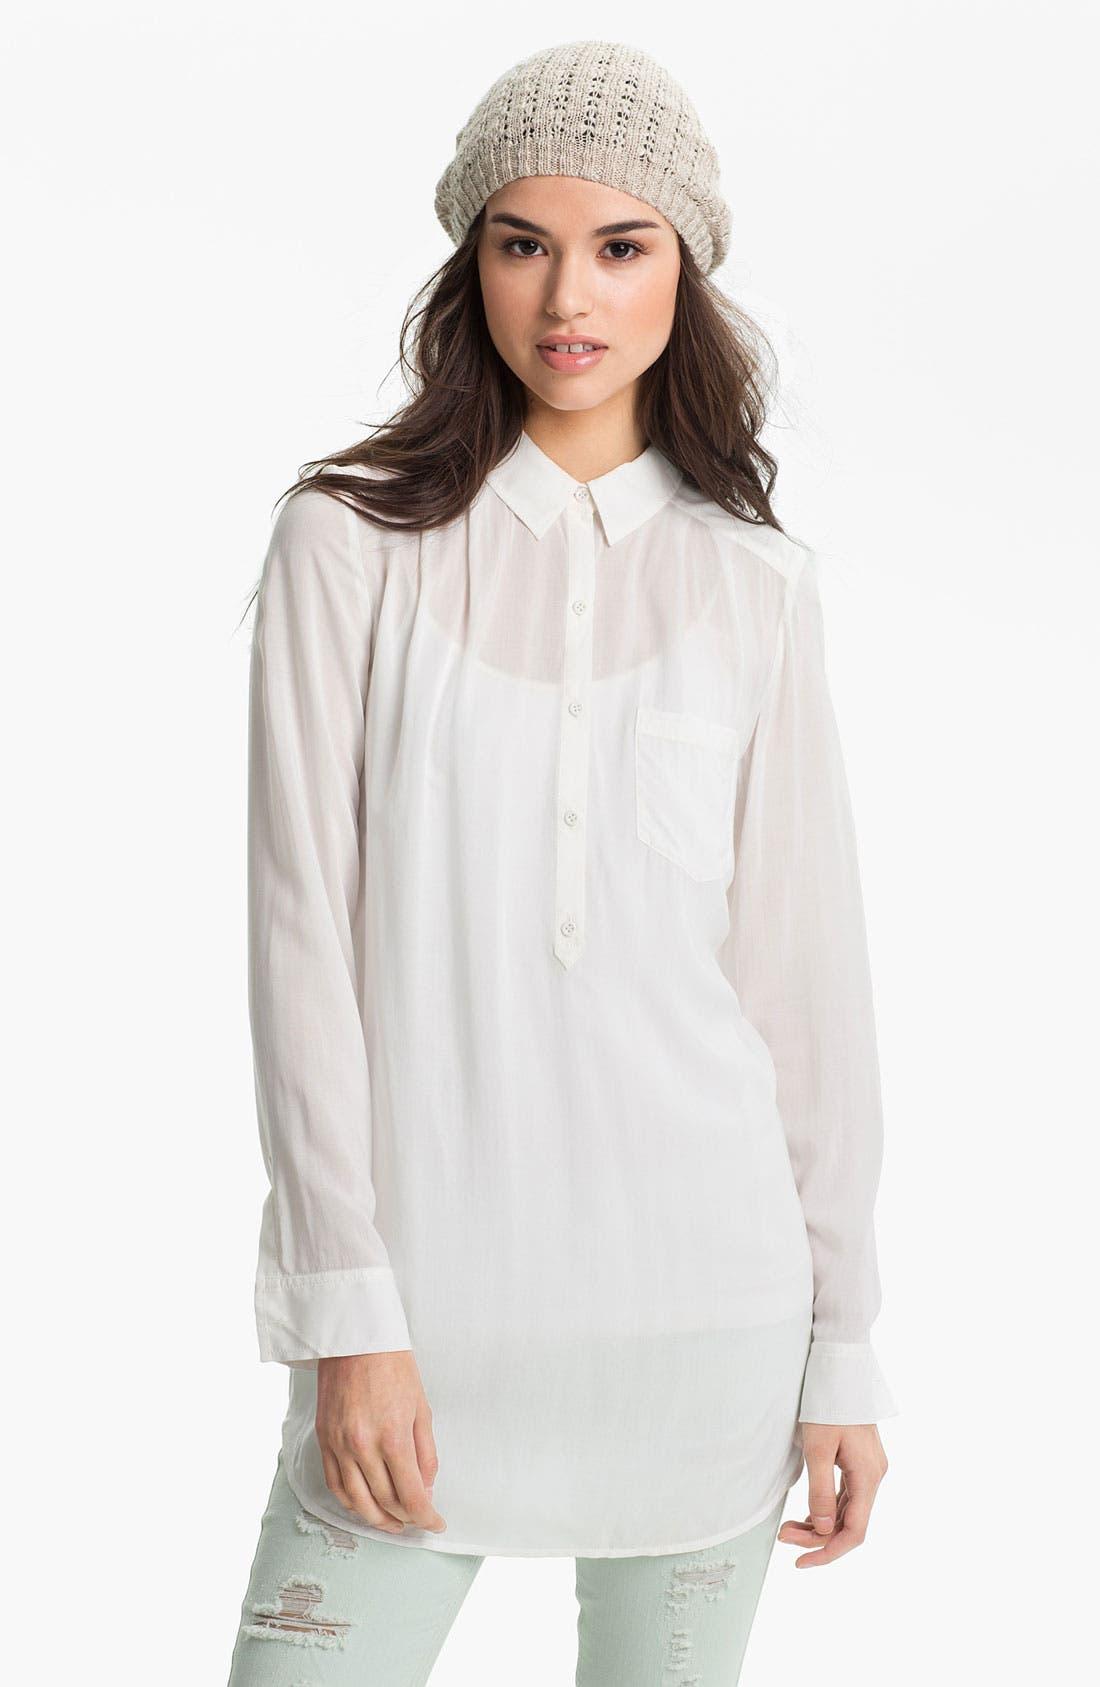 Alternate Image 1 Selected - BP. 'Wanderlust' Shirt Tunic (Juniors)